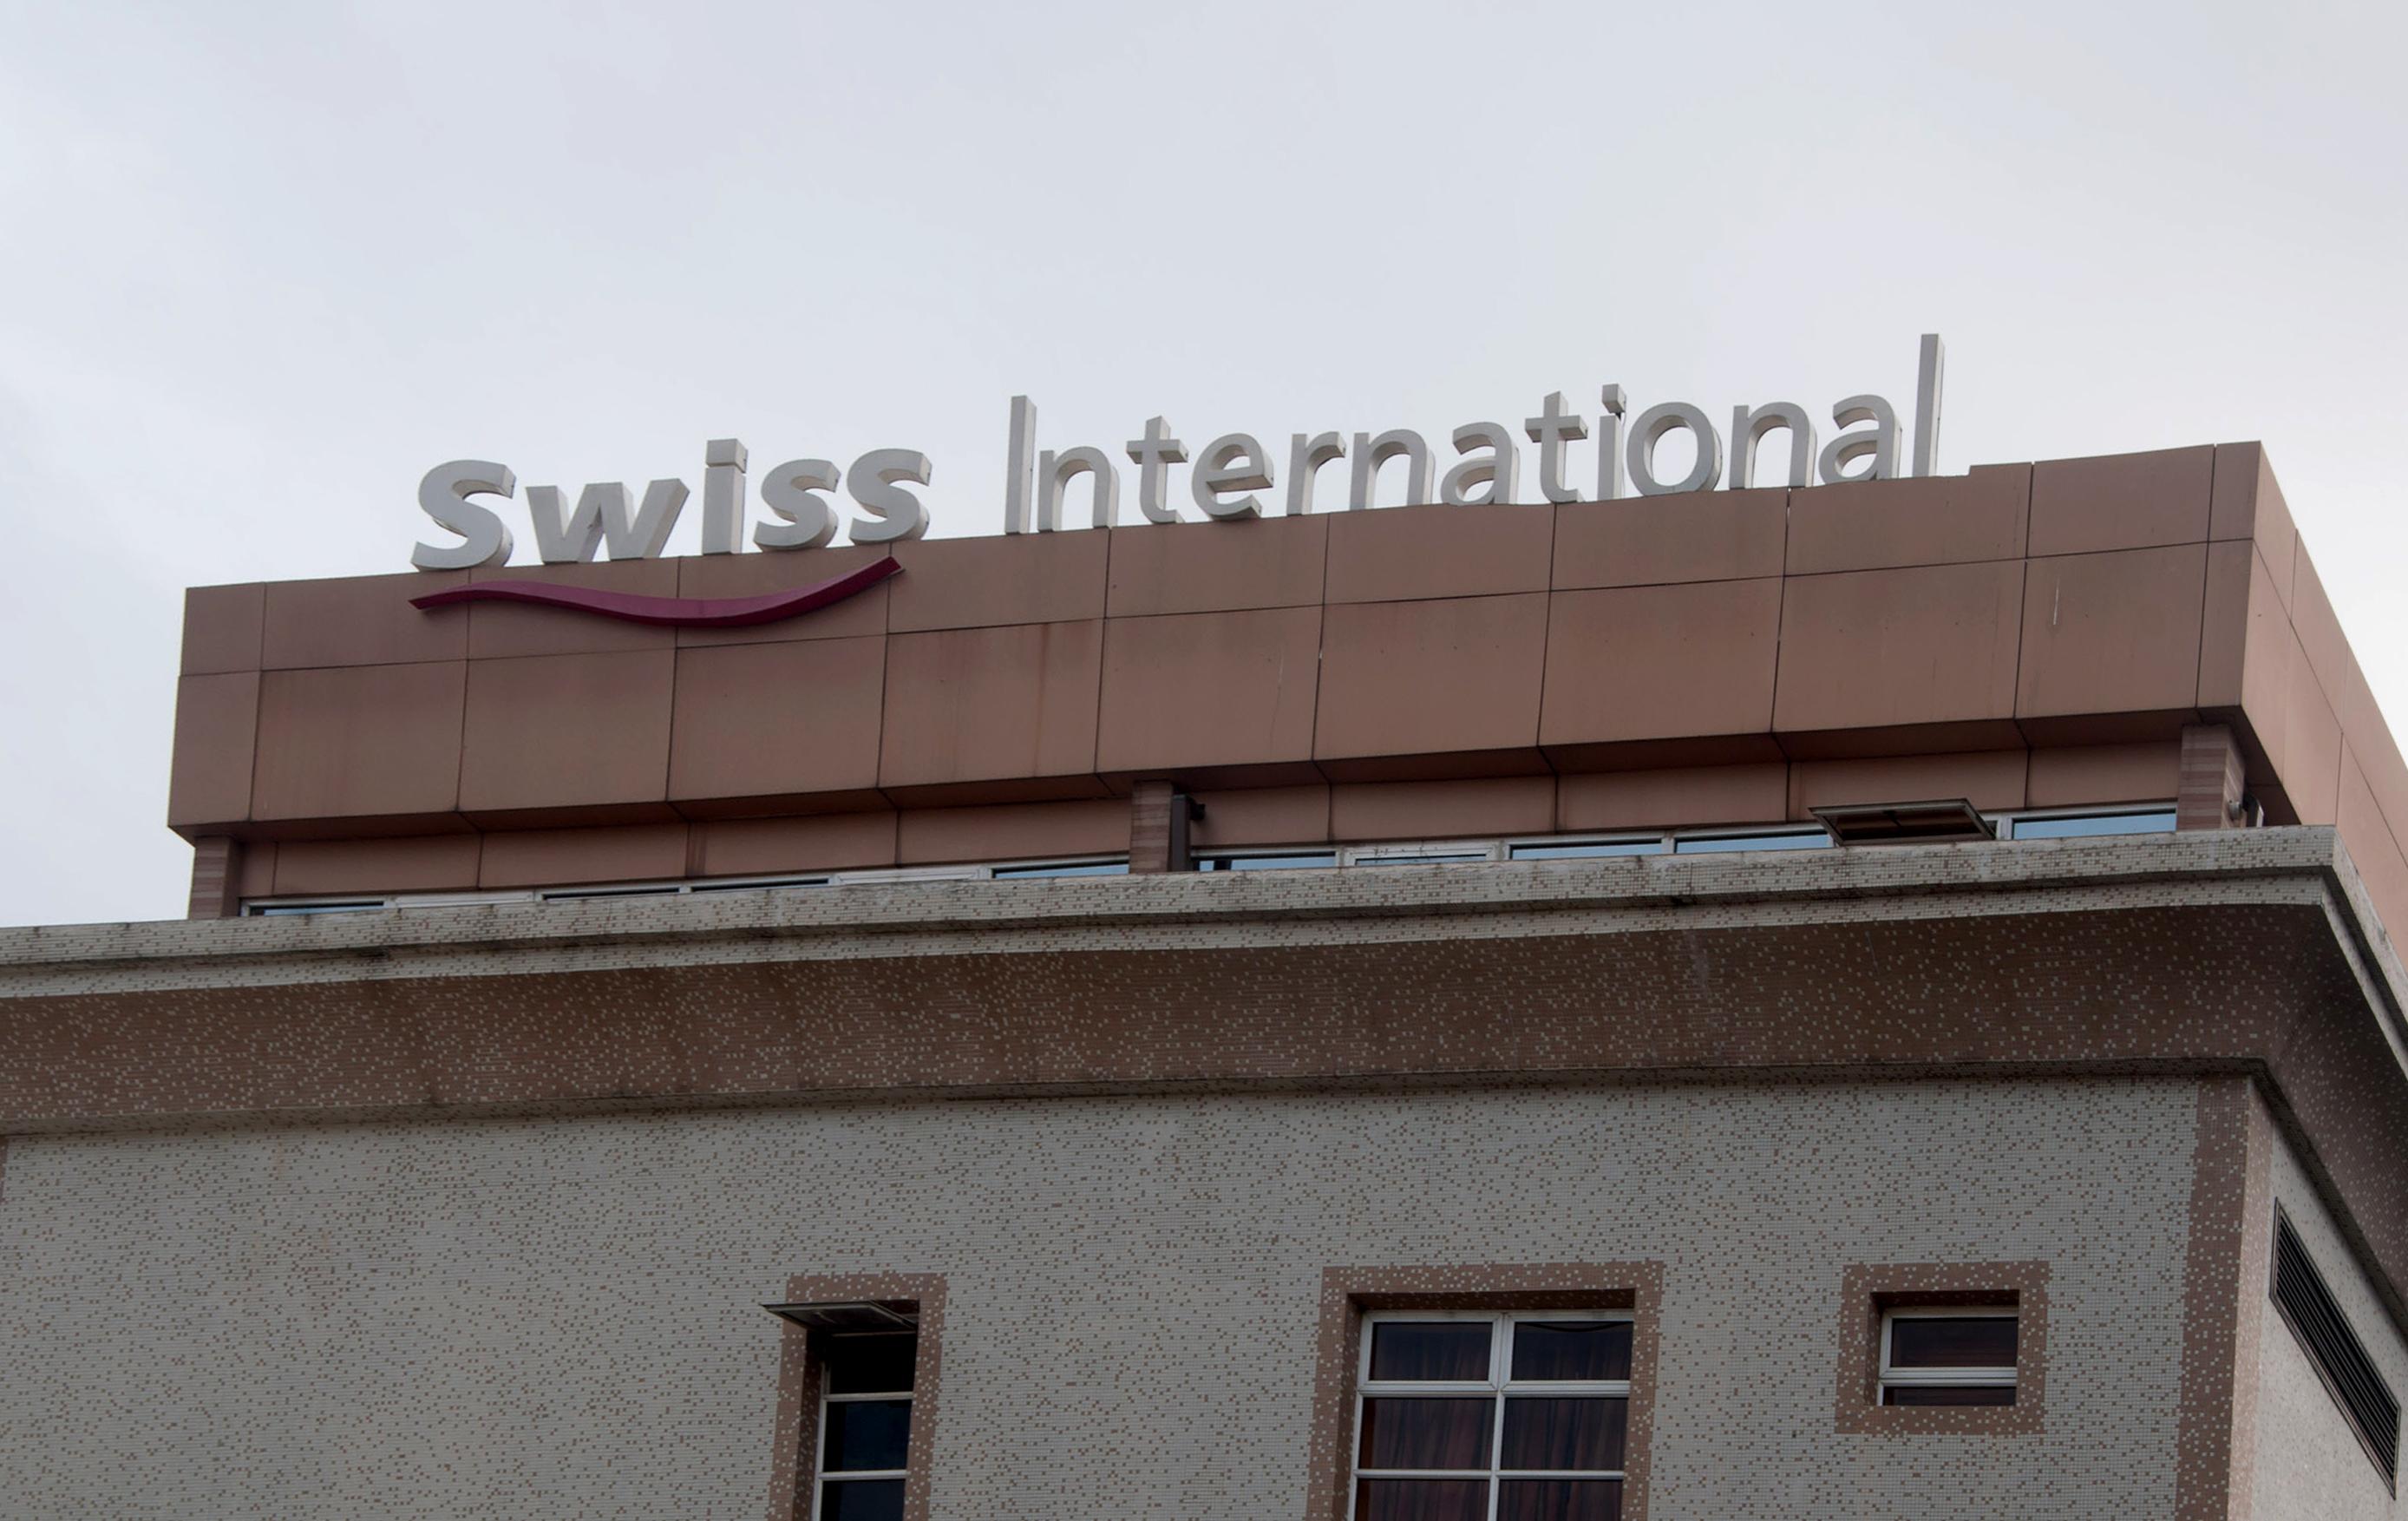 Swiss International D' Palm Airport, Mushin